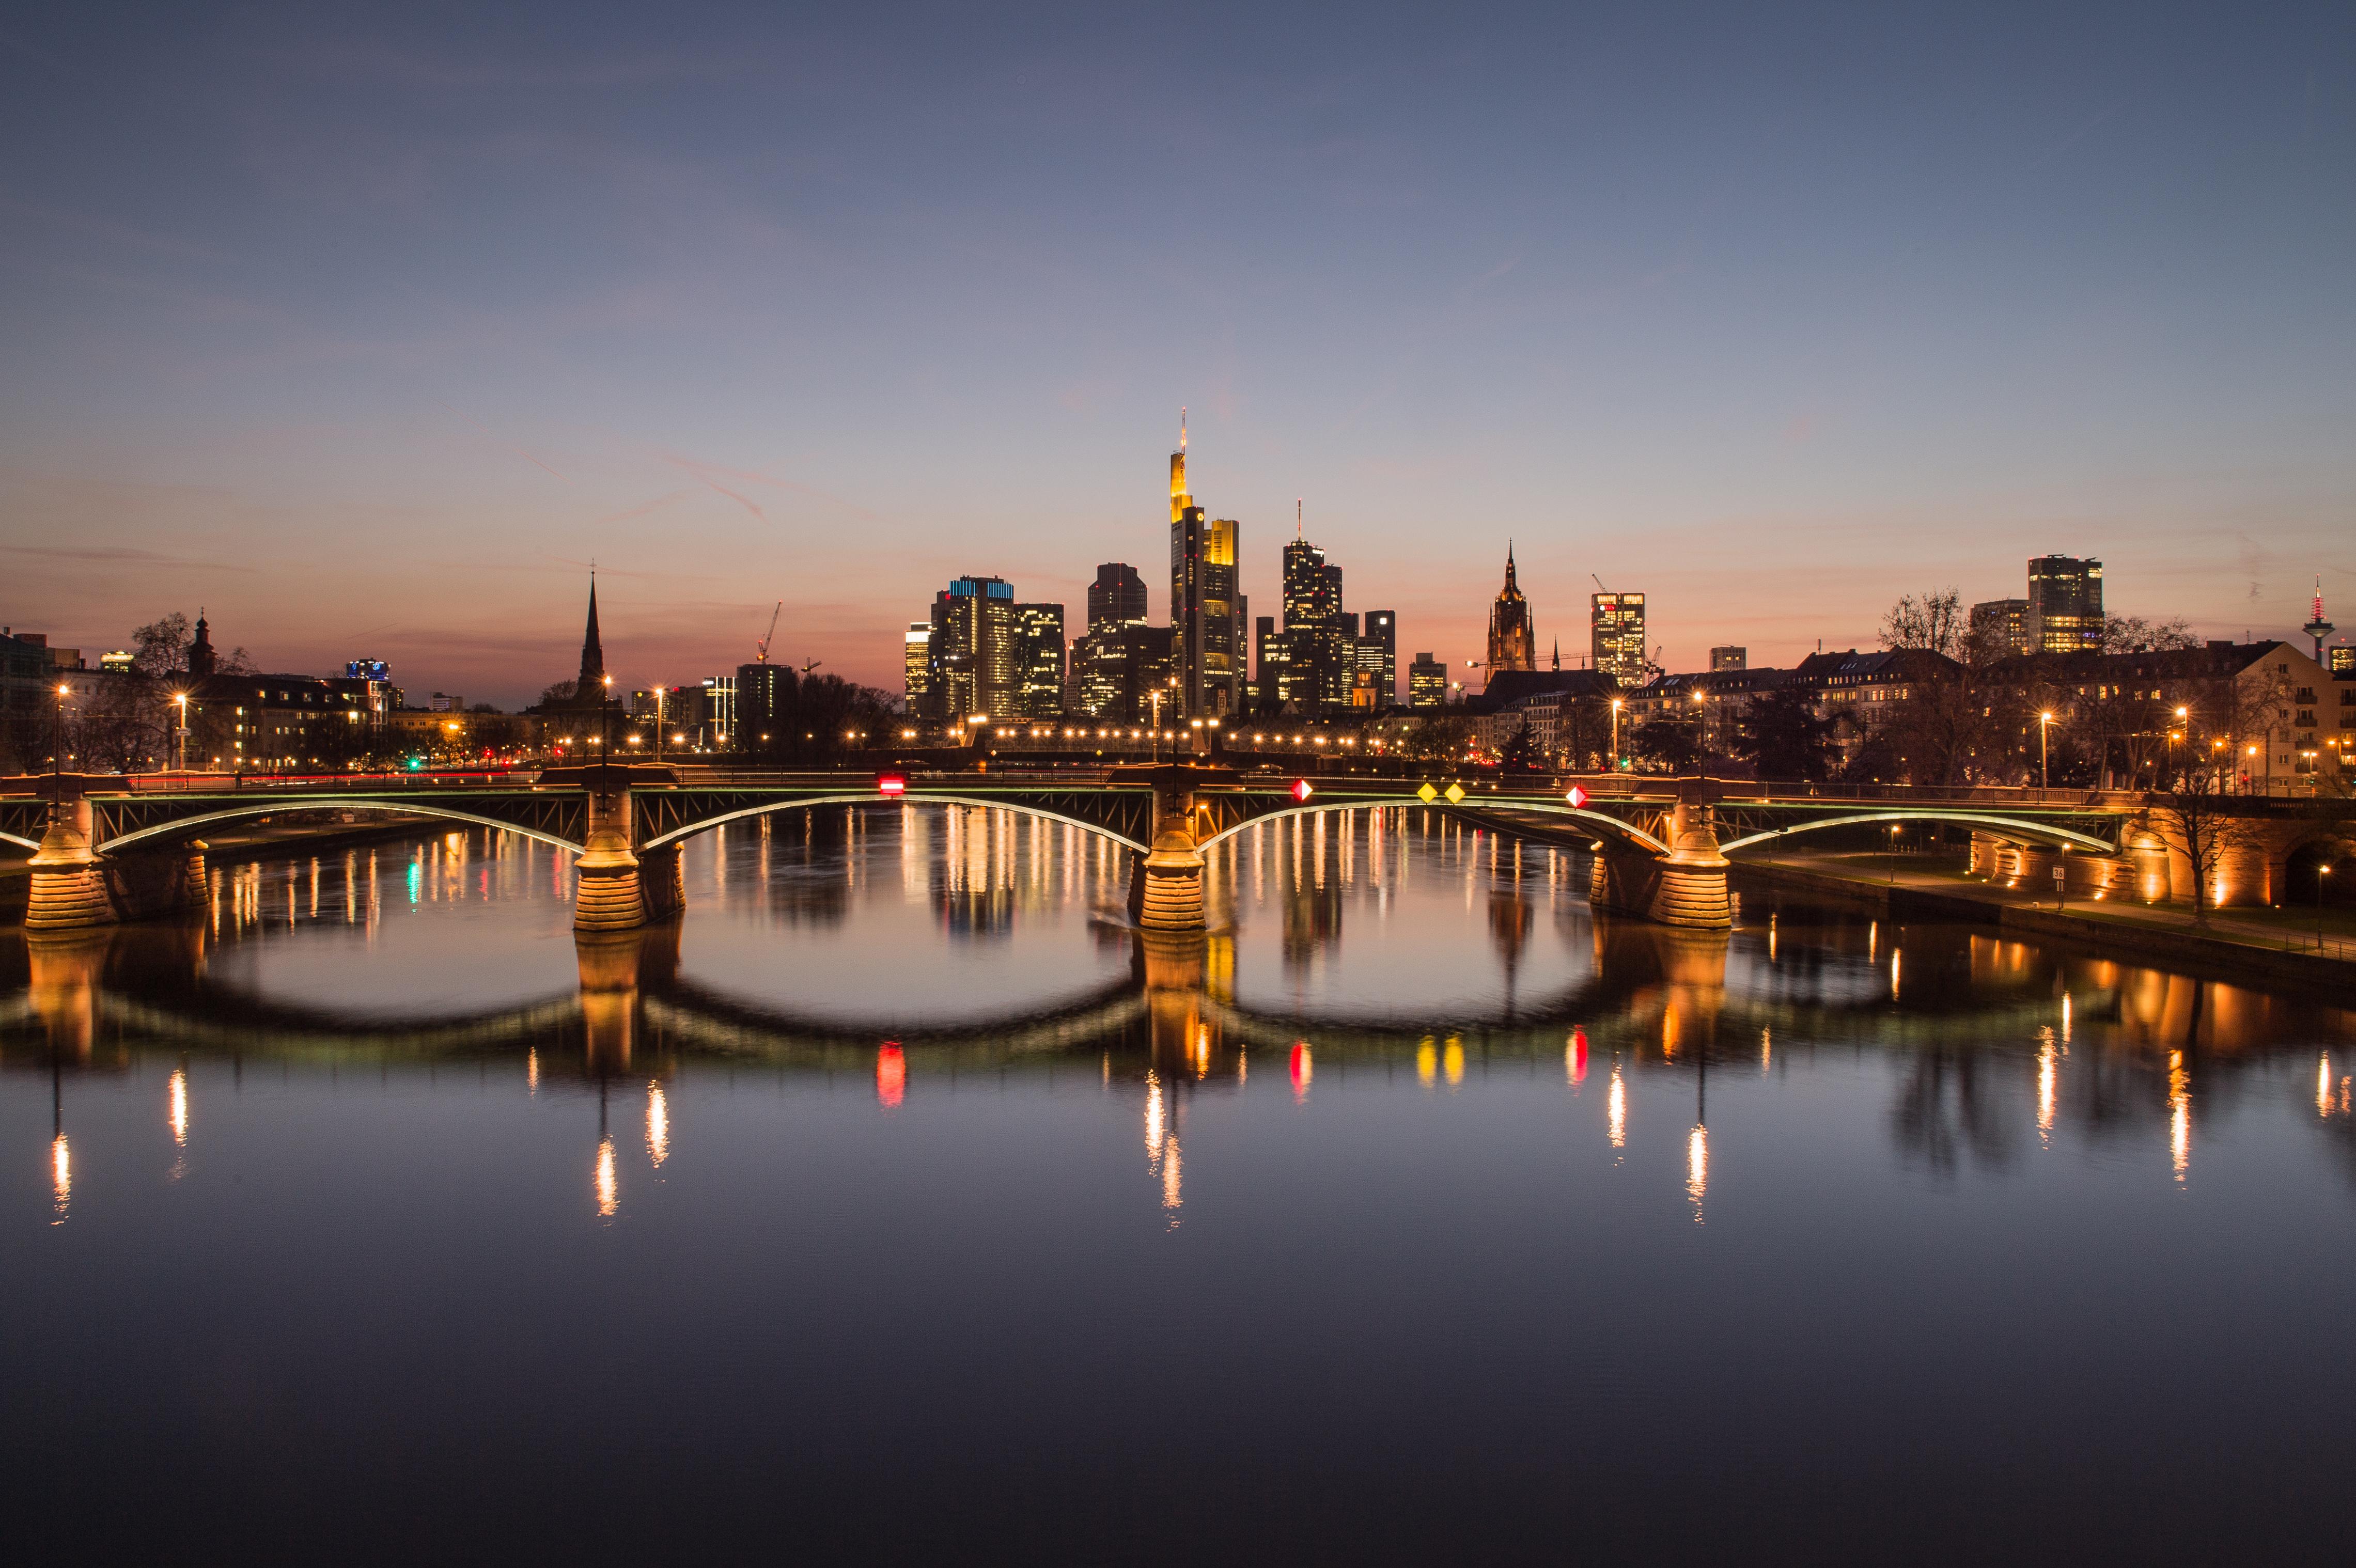 Germany's Main River